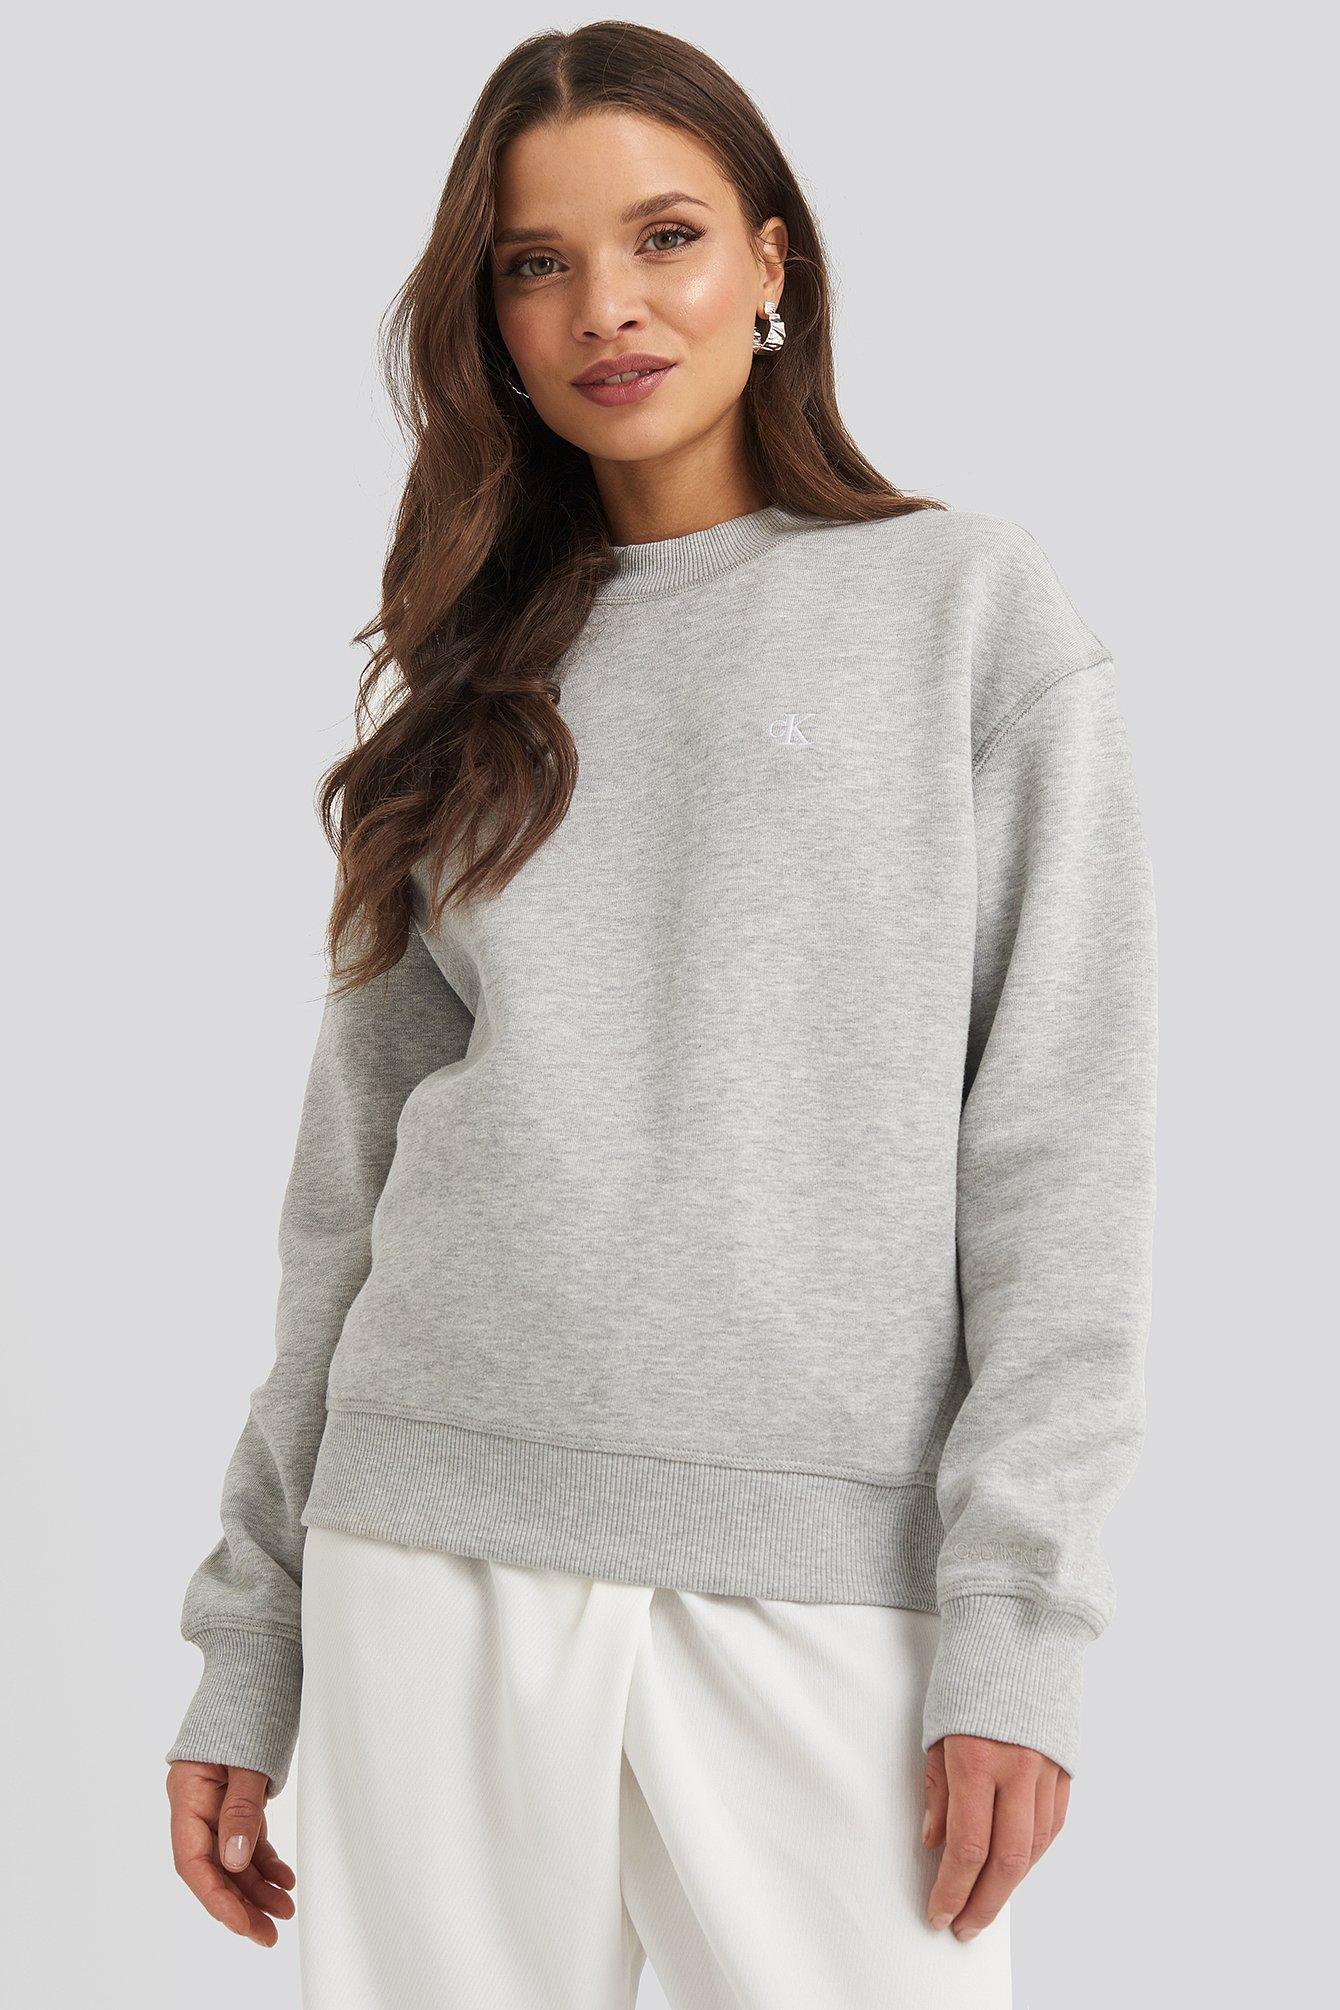 calvin klein -  Embroidery Regular Crew Neck Sweater - Grey